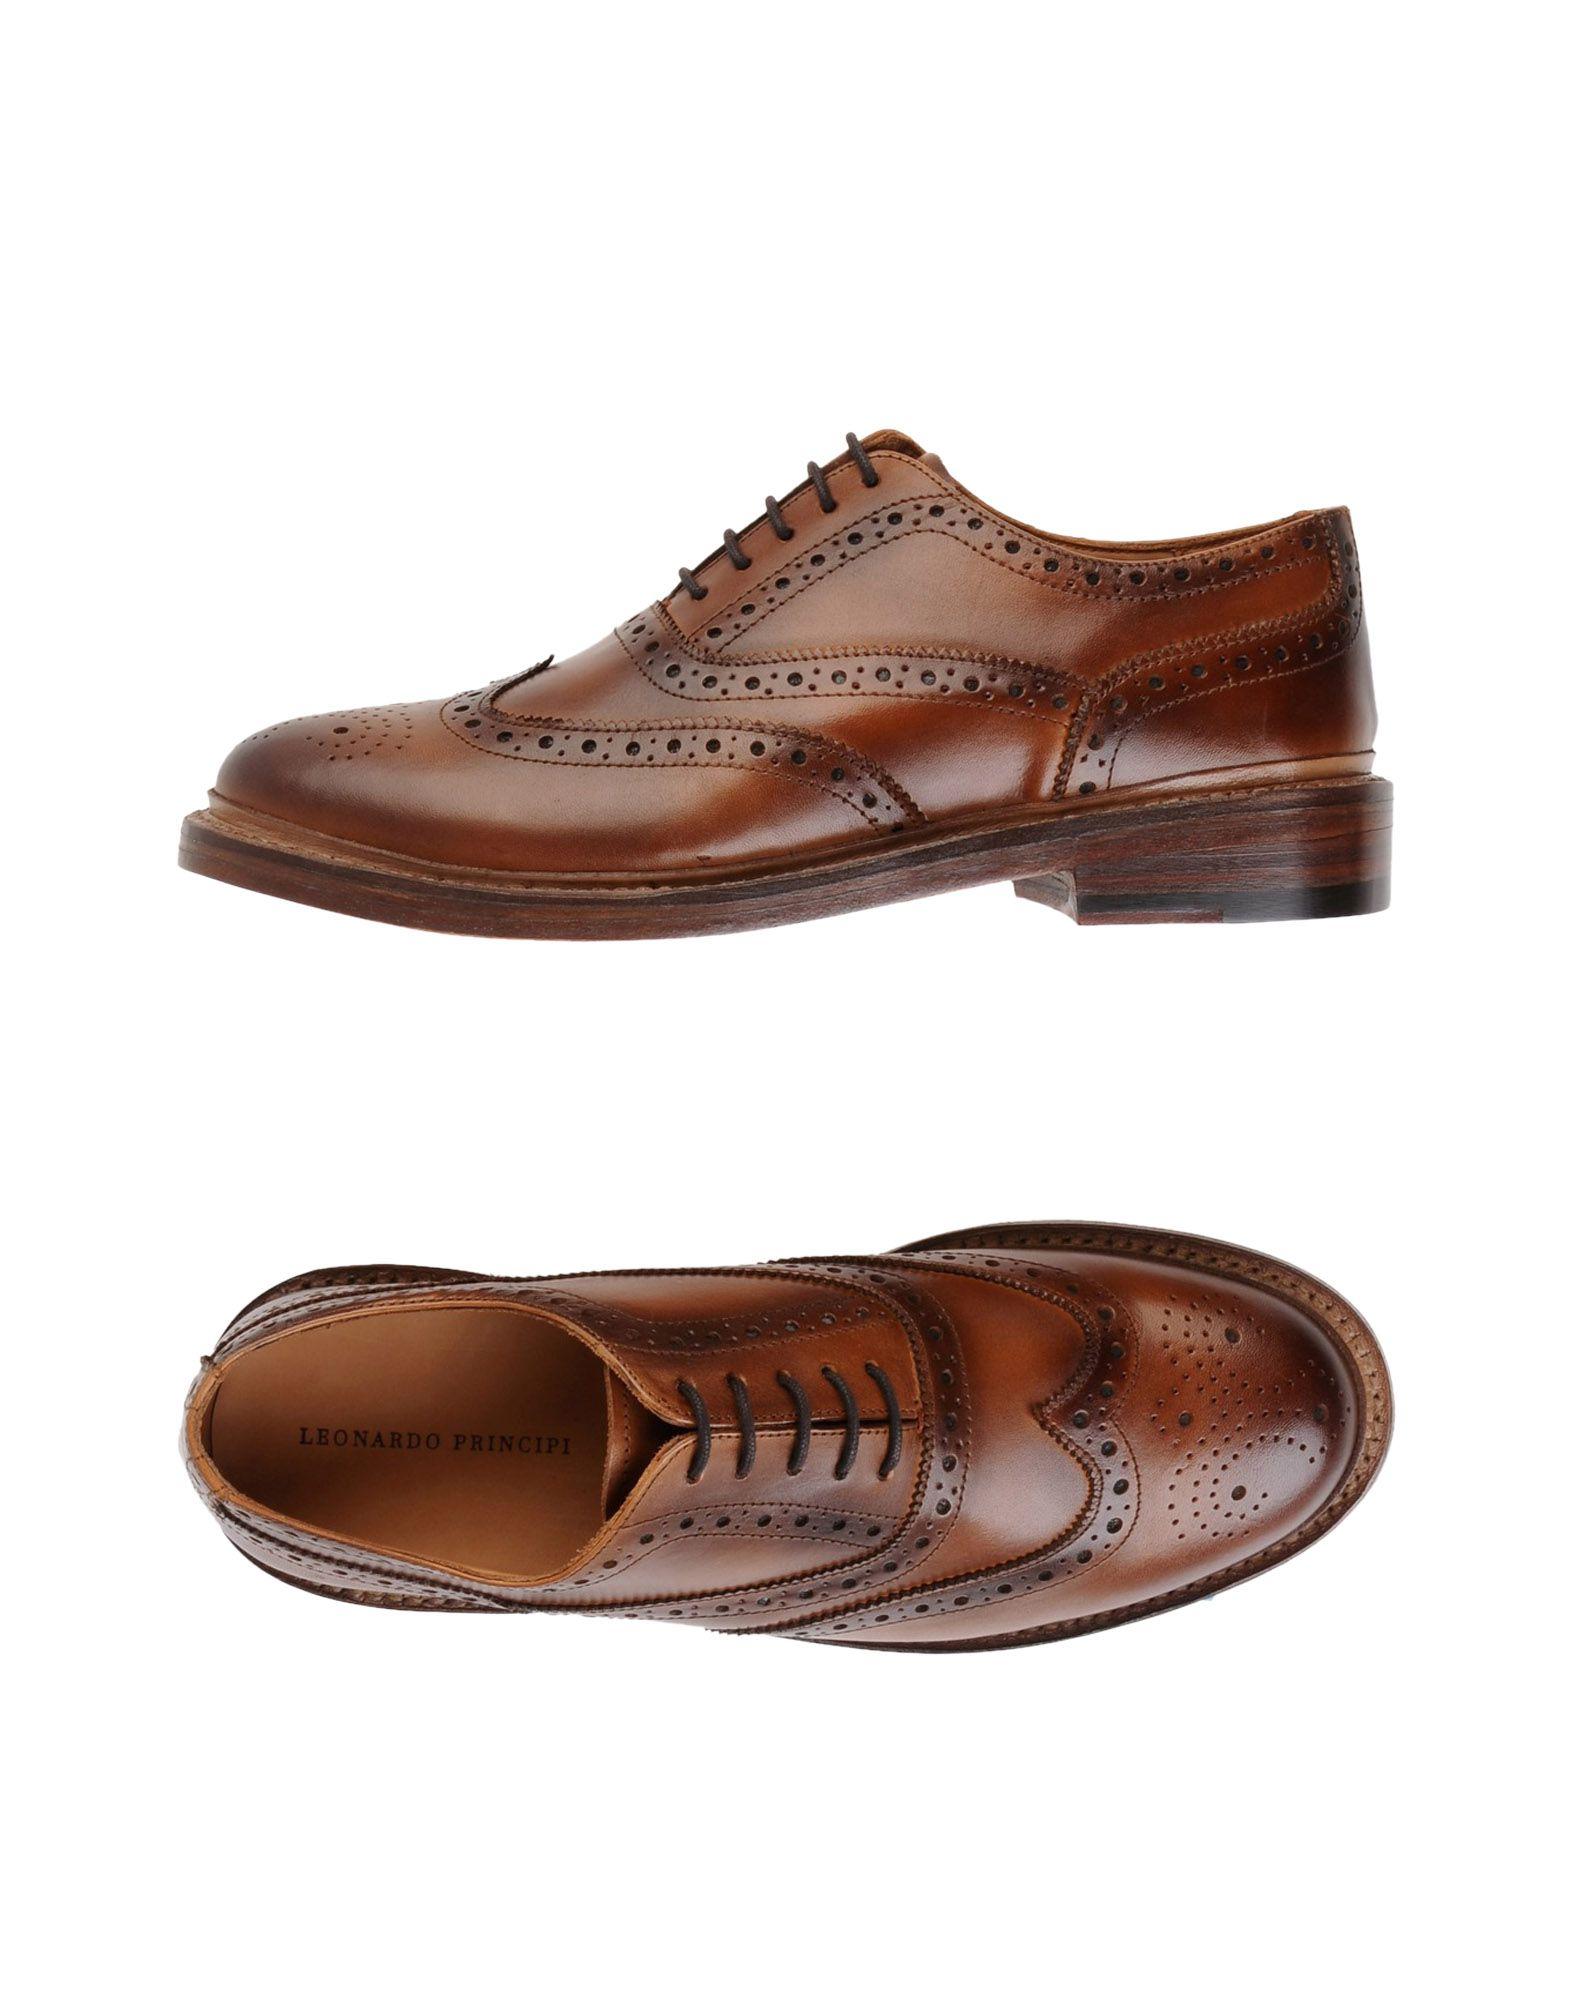 Leonardo Principi Schnürschuhe Herren  11539582RJ Gute Gute Gute Qualität beliebte Schuhe 9074fa